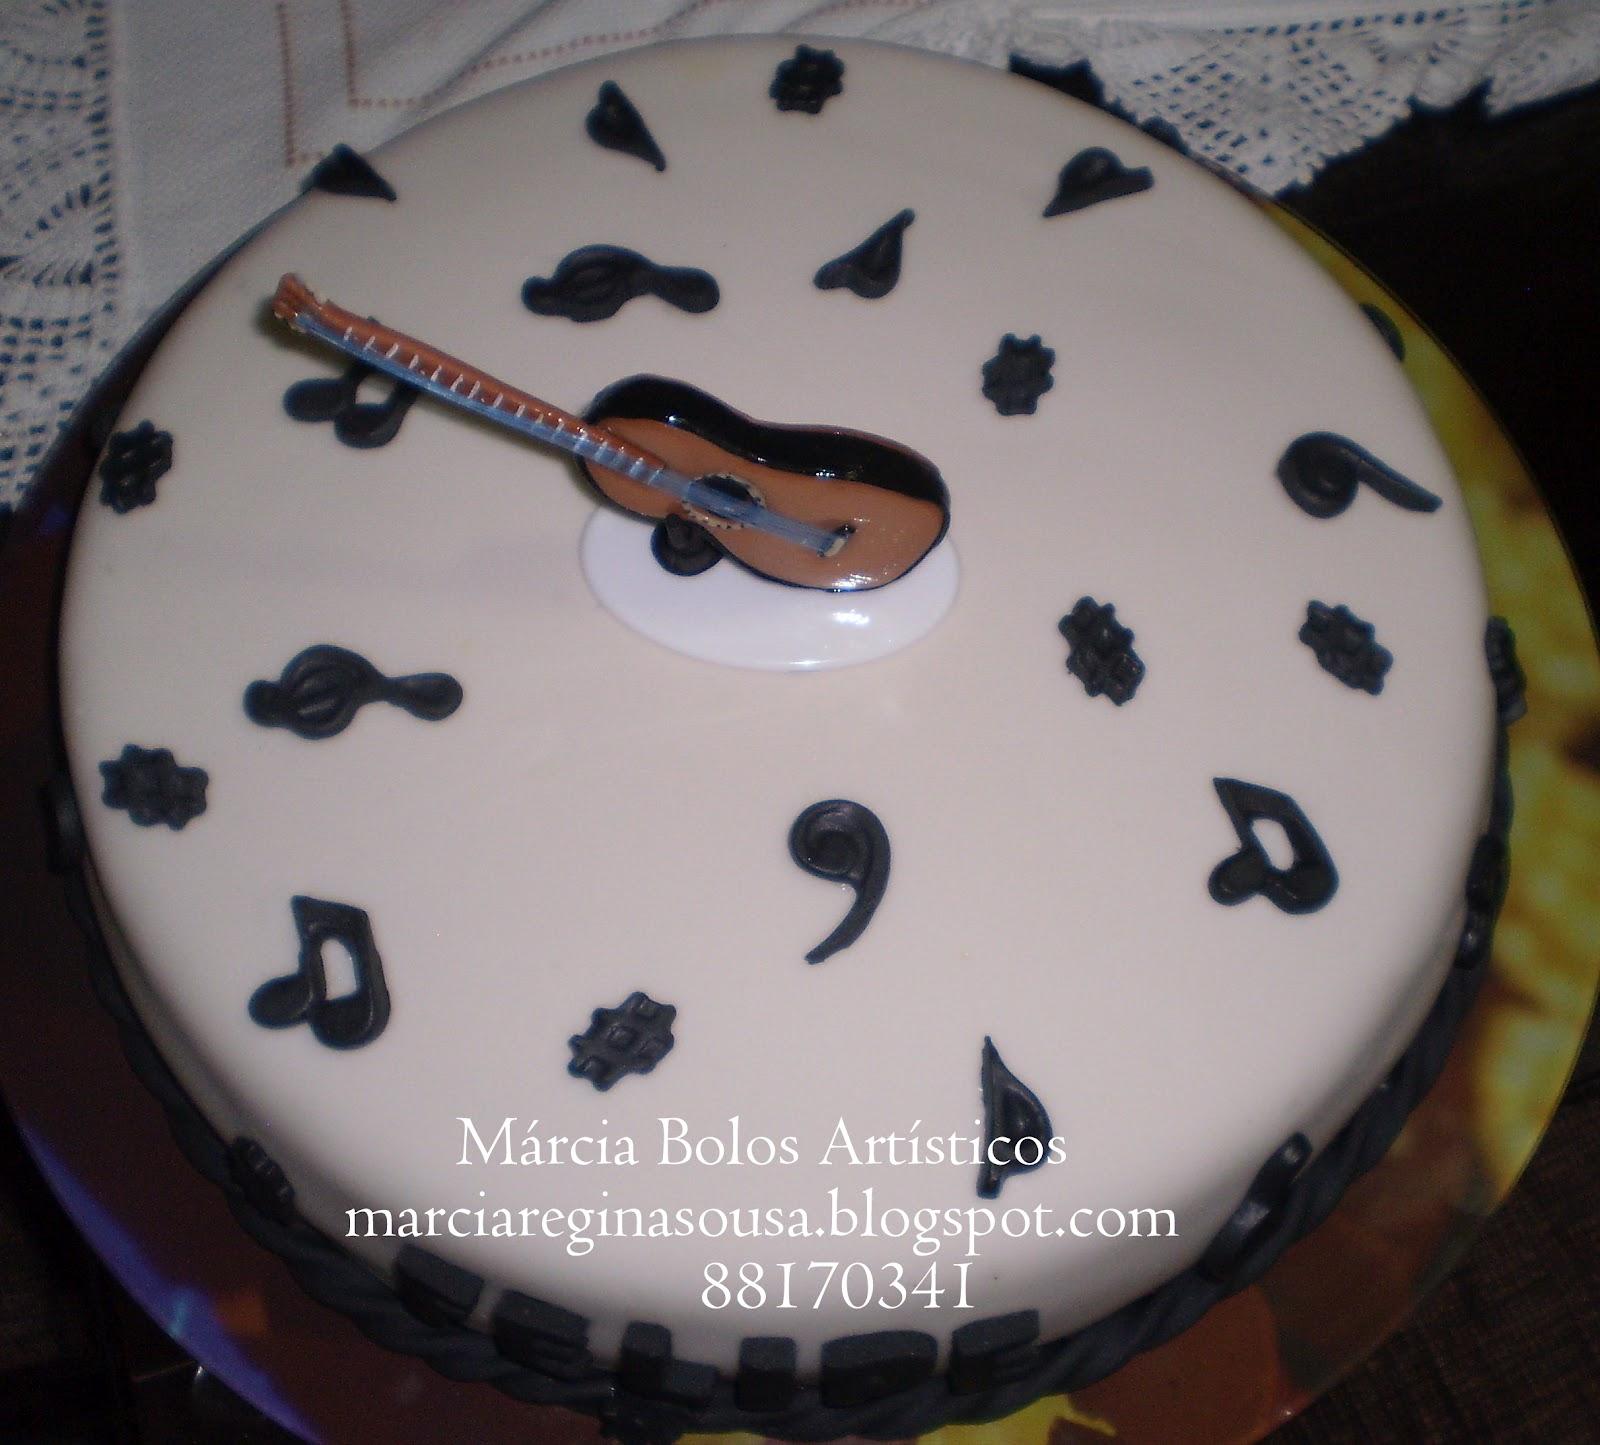 decoracao festa notas musicais:Notas Musicais Para Decoracao De Festas Tematicas Kit Notas Musicais